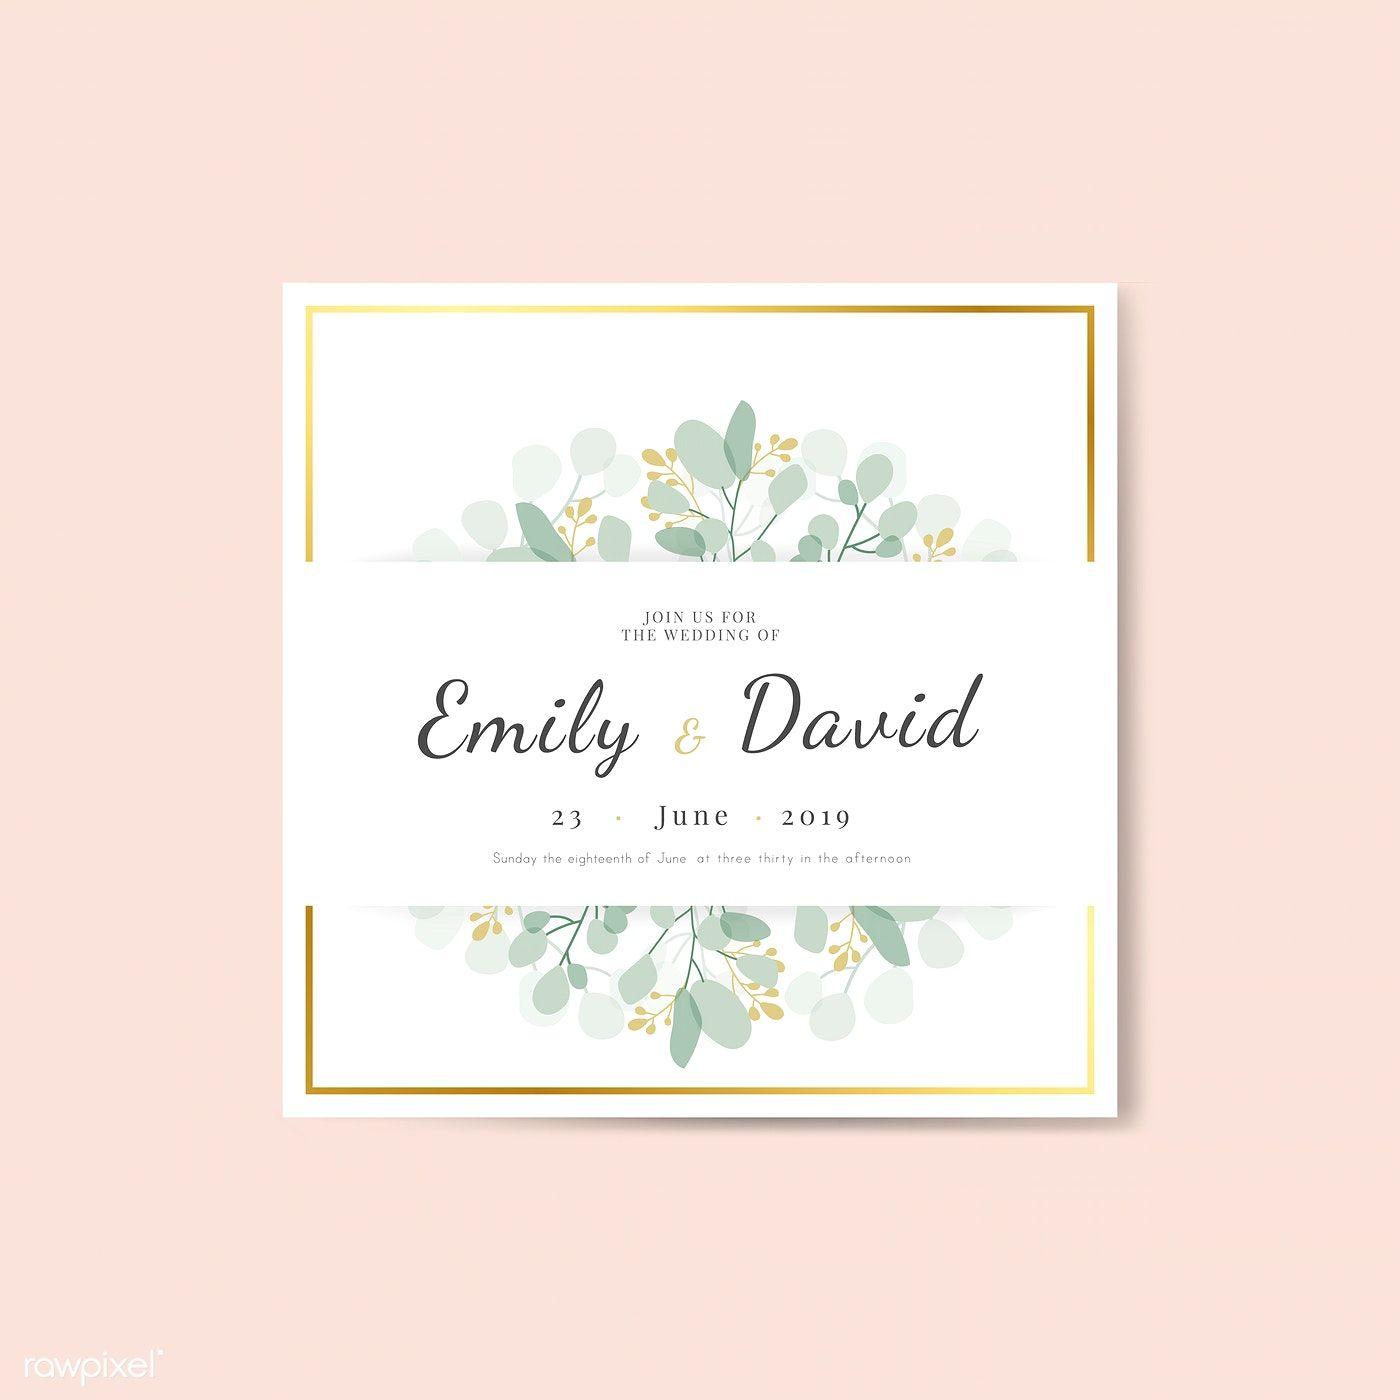 Floral wedding invitation square card template vector  premium